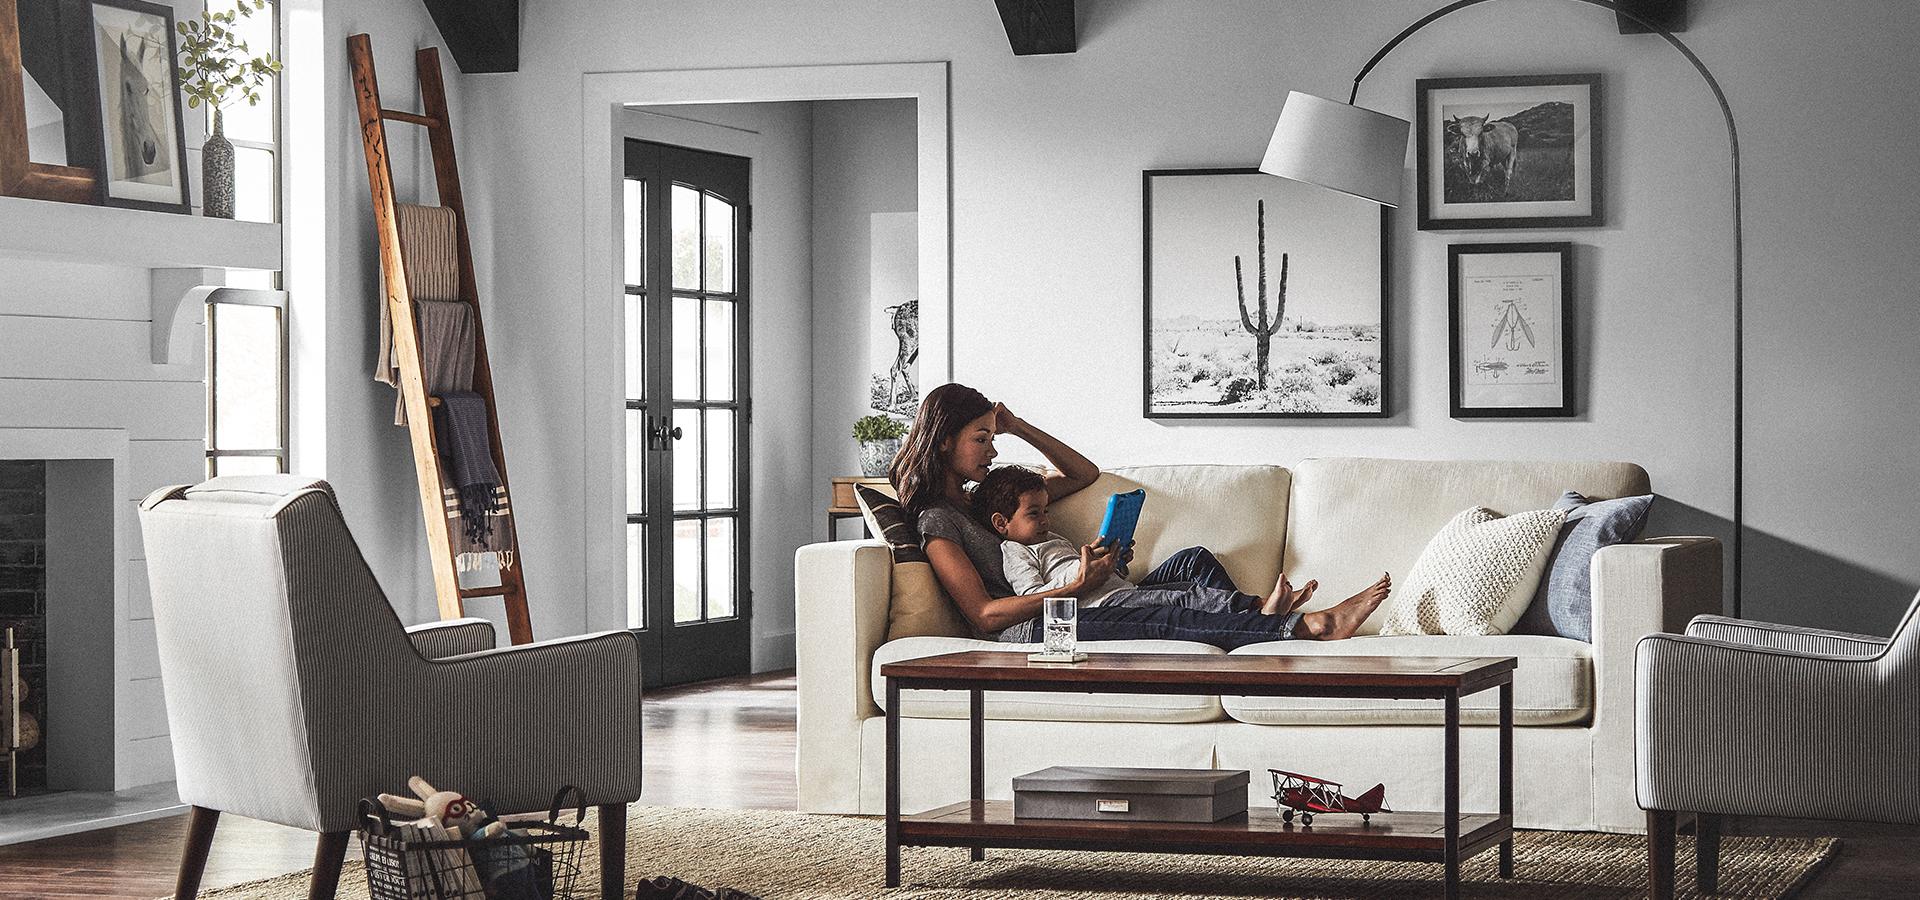 amazon private label stone beam marcellus neel. Black Bedroom Furniture Sets. Home Design Ideas